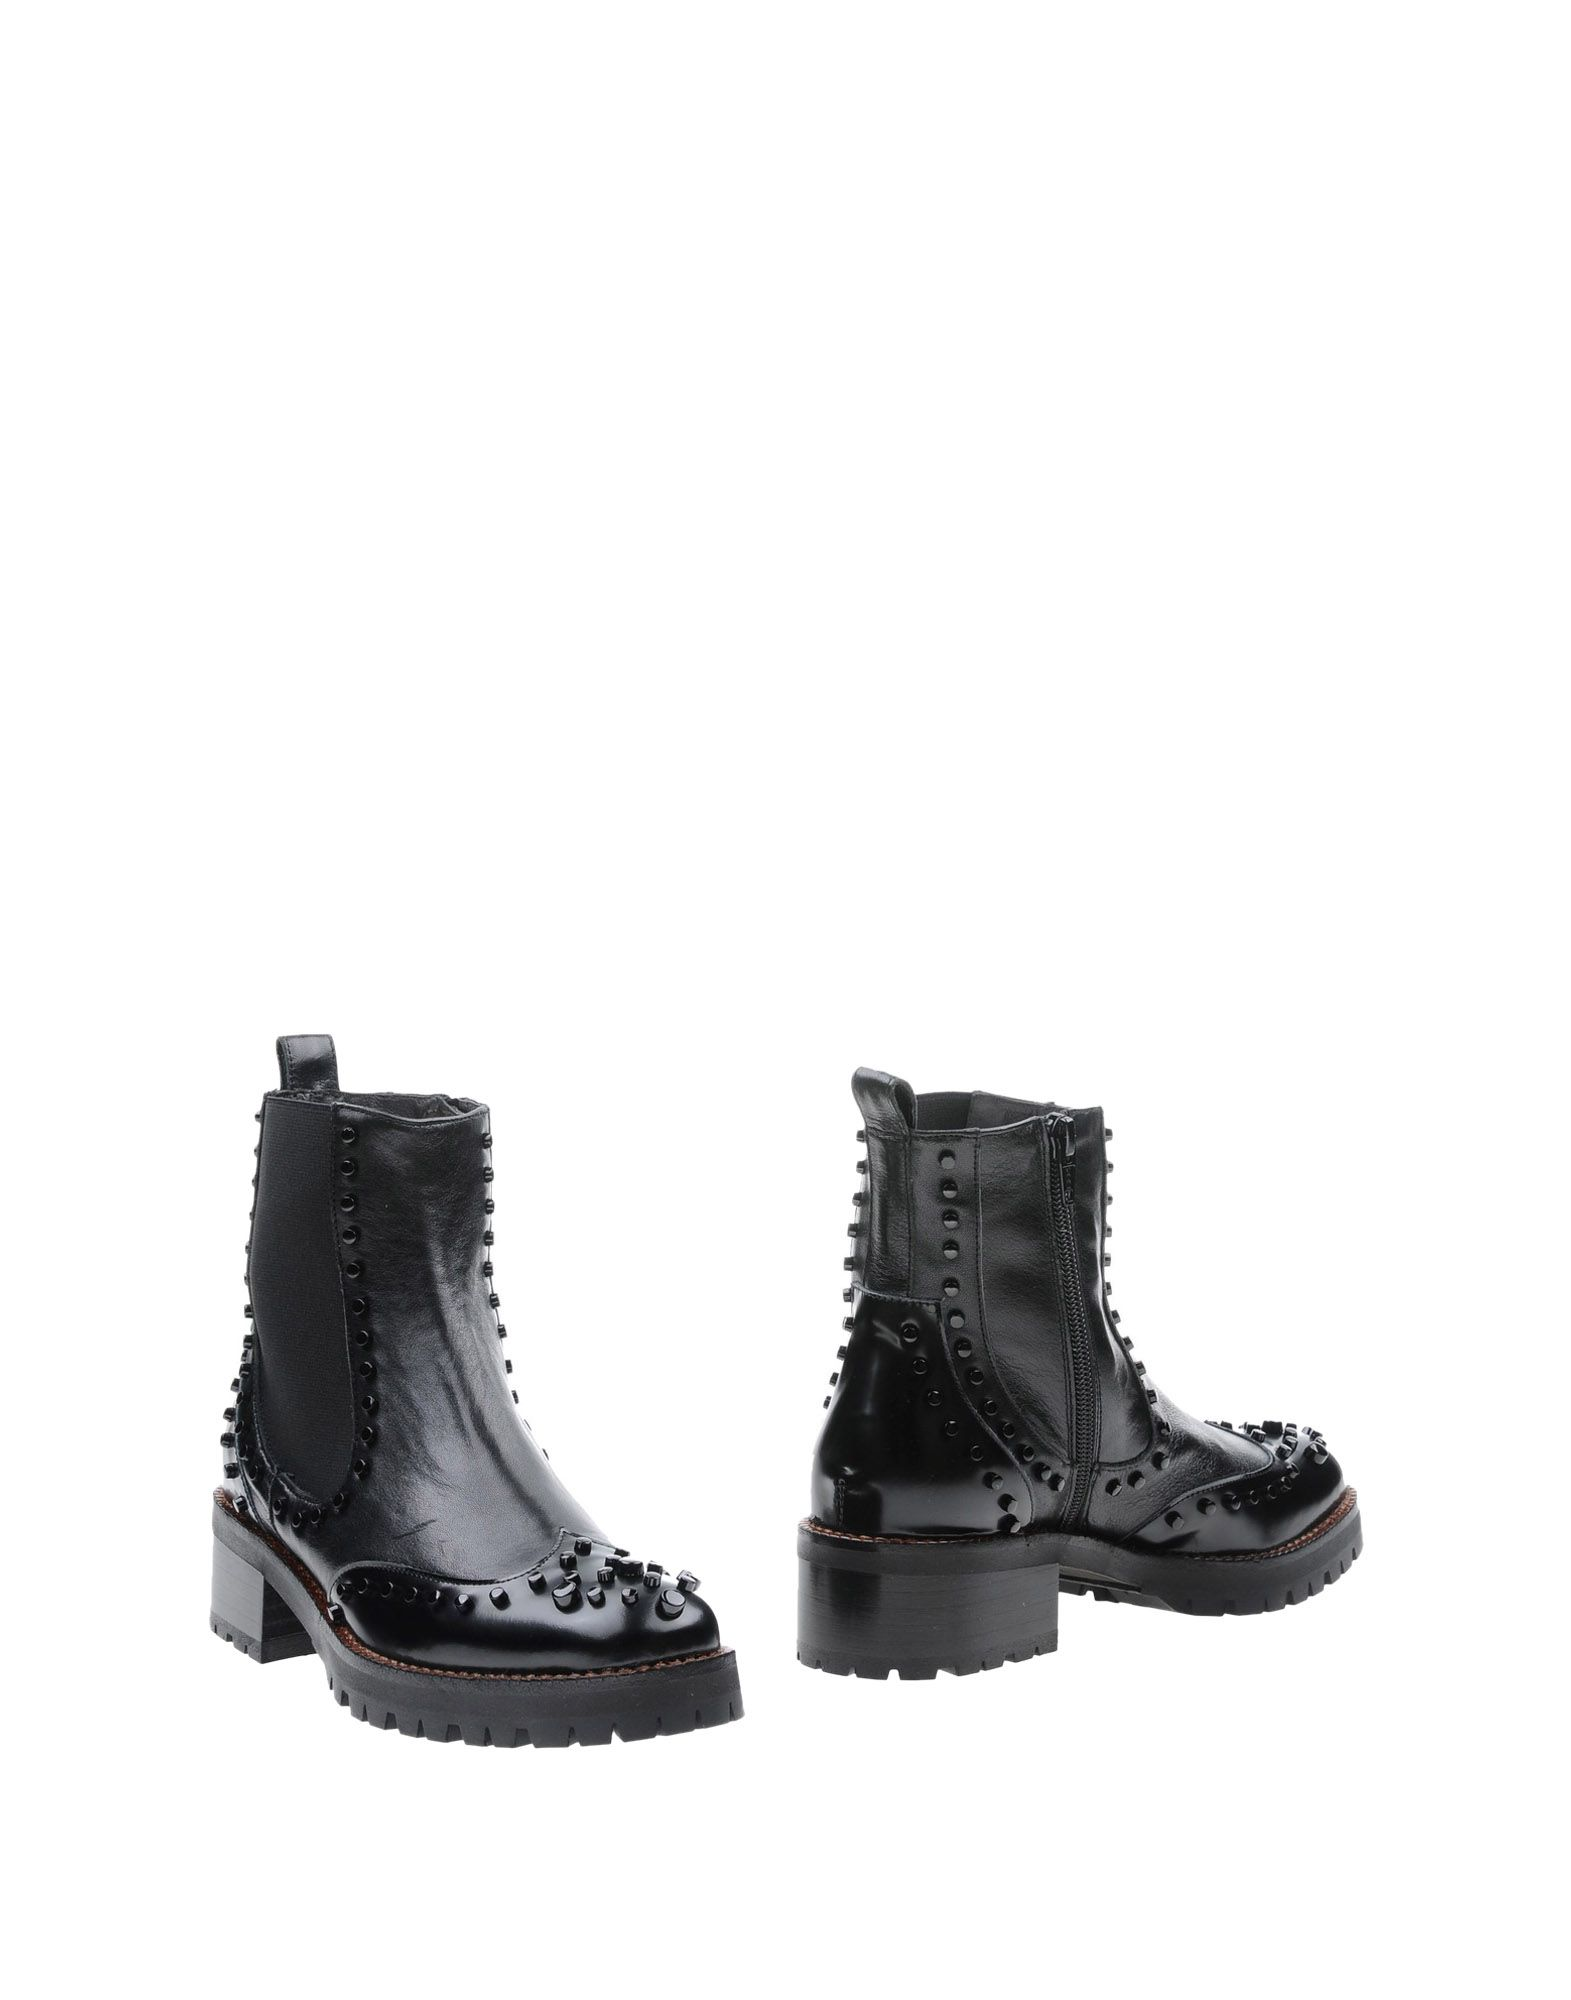 Zinda Ankle Boot - Women on Zinda Ankle Boots online on Women  Australia - 11343410MO 35cac0